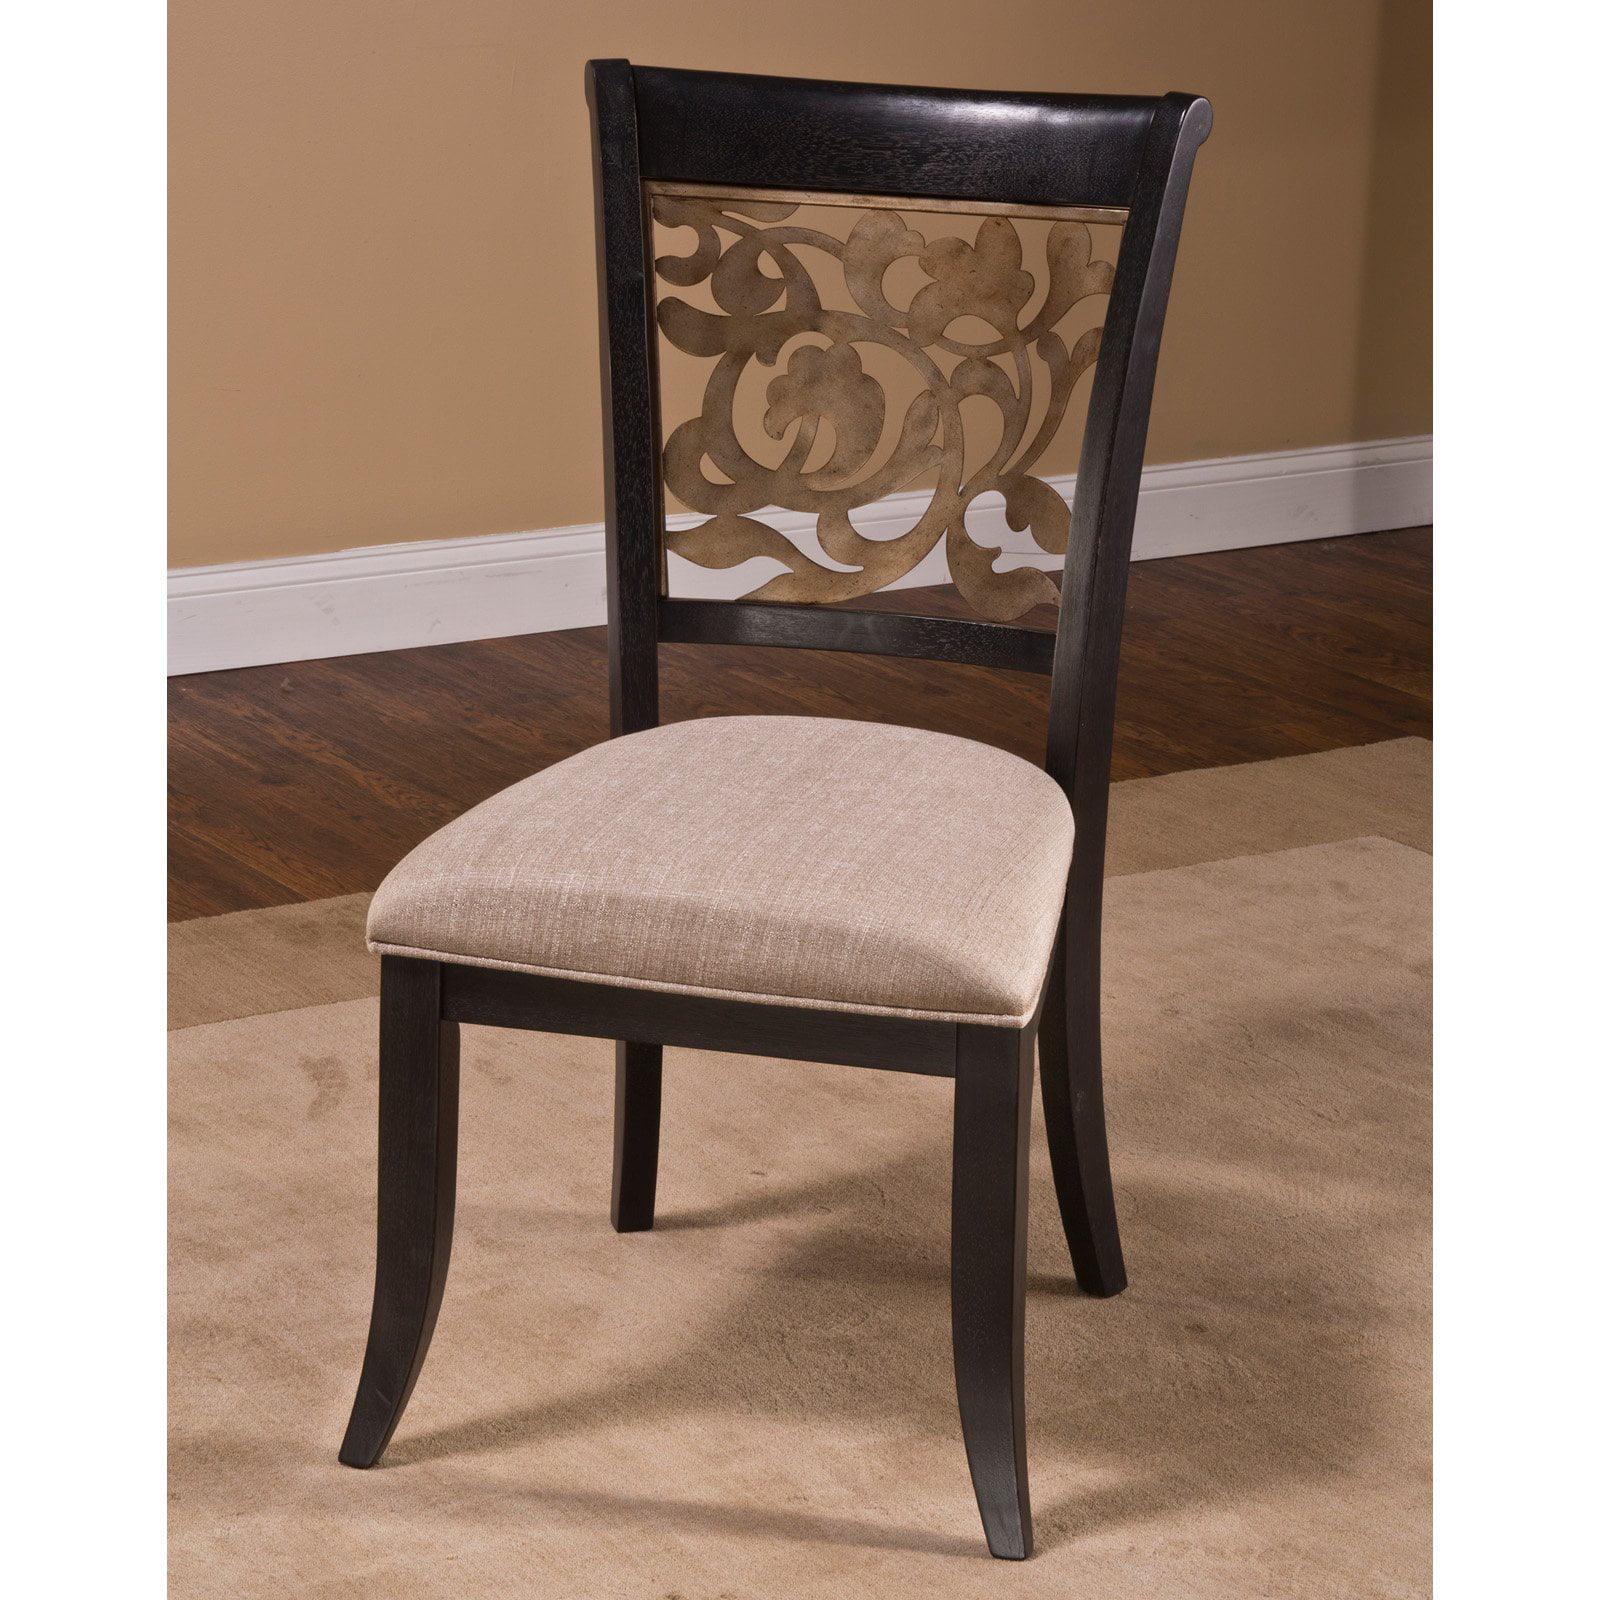 Hillsdsale Bennington Dining Chair, Set of 2 by Hillsdale Furniture